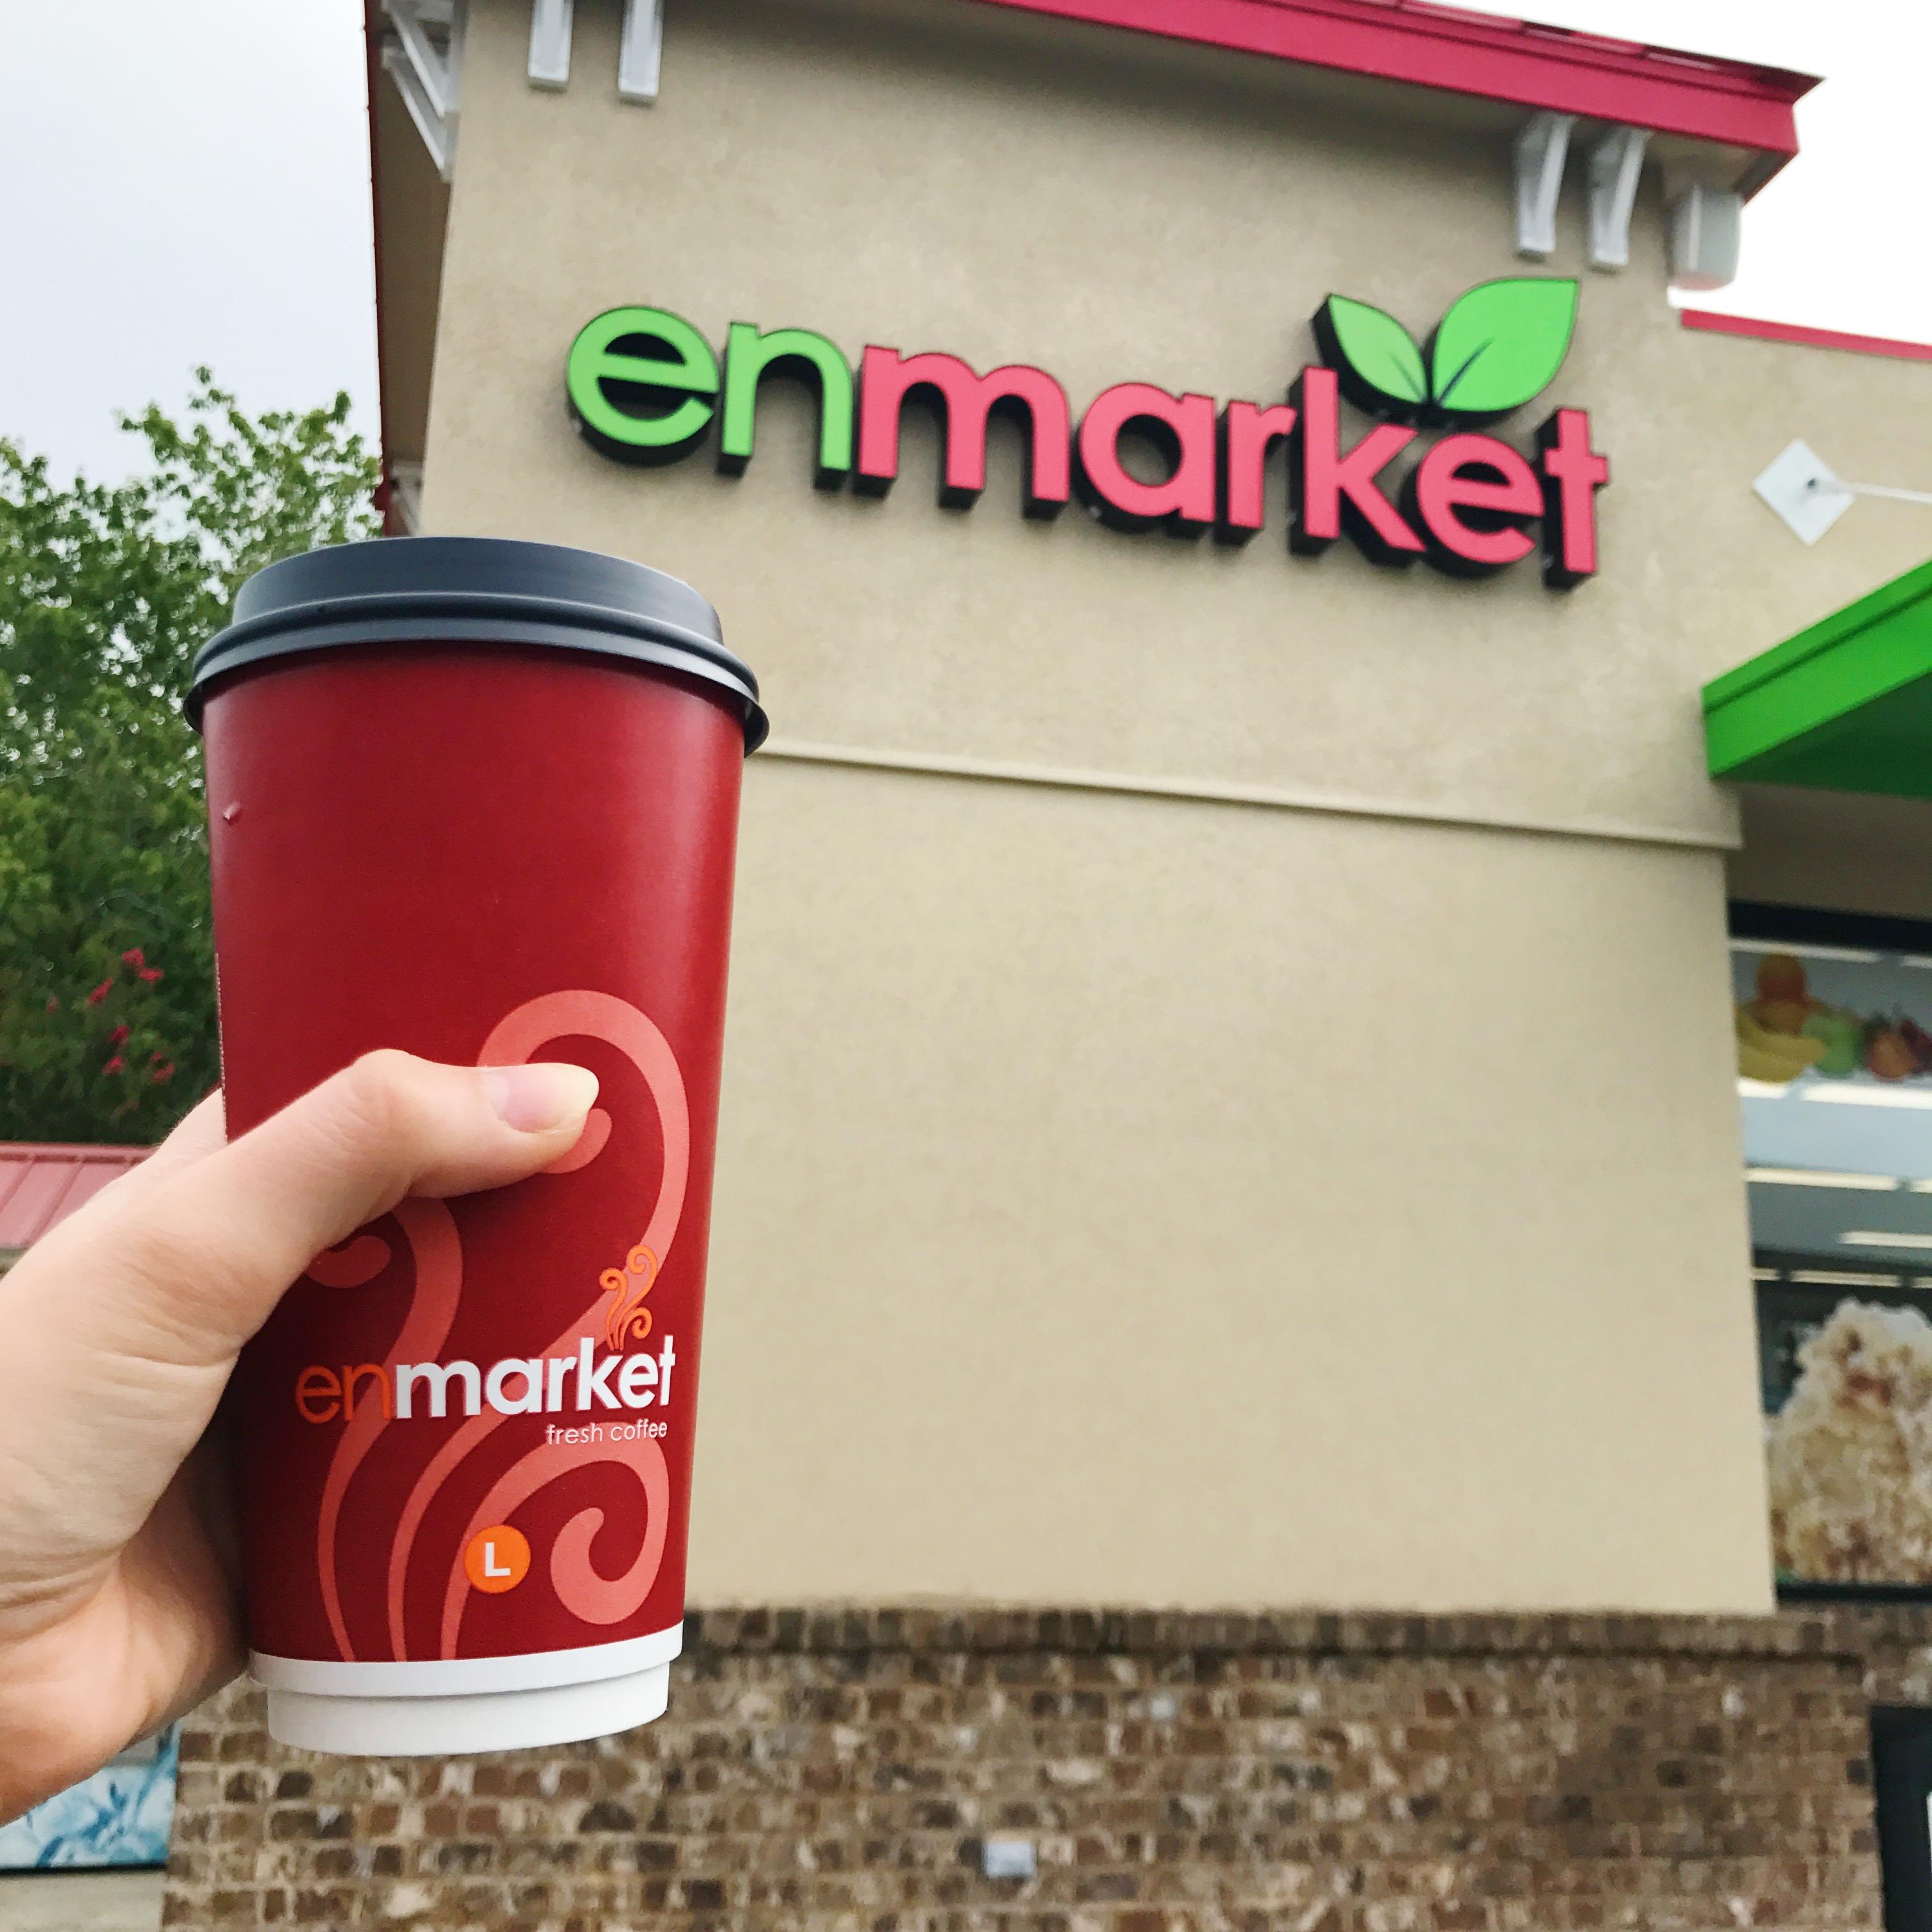 Enmarket Rainforest Alliance & Direct Trade Coffee To Go